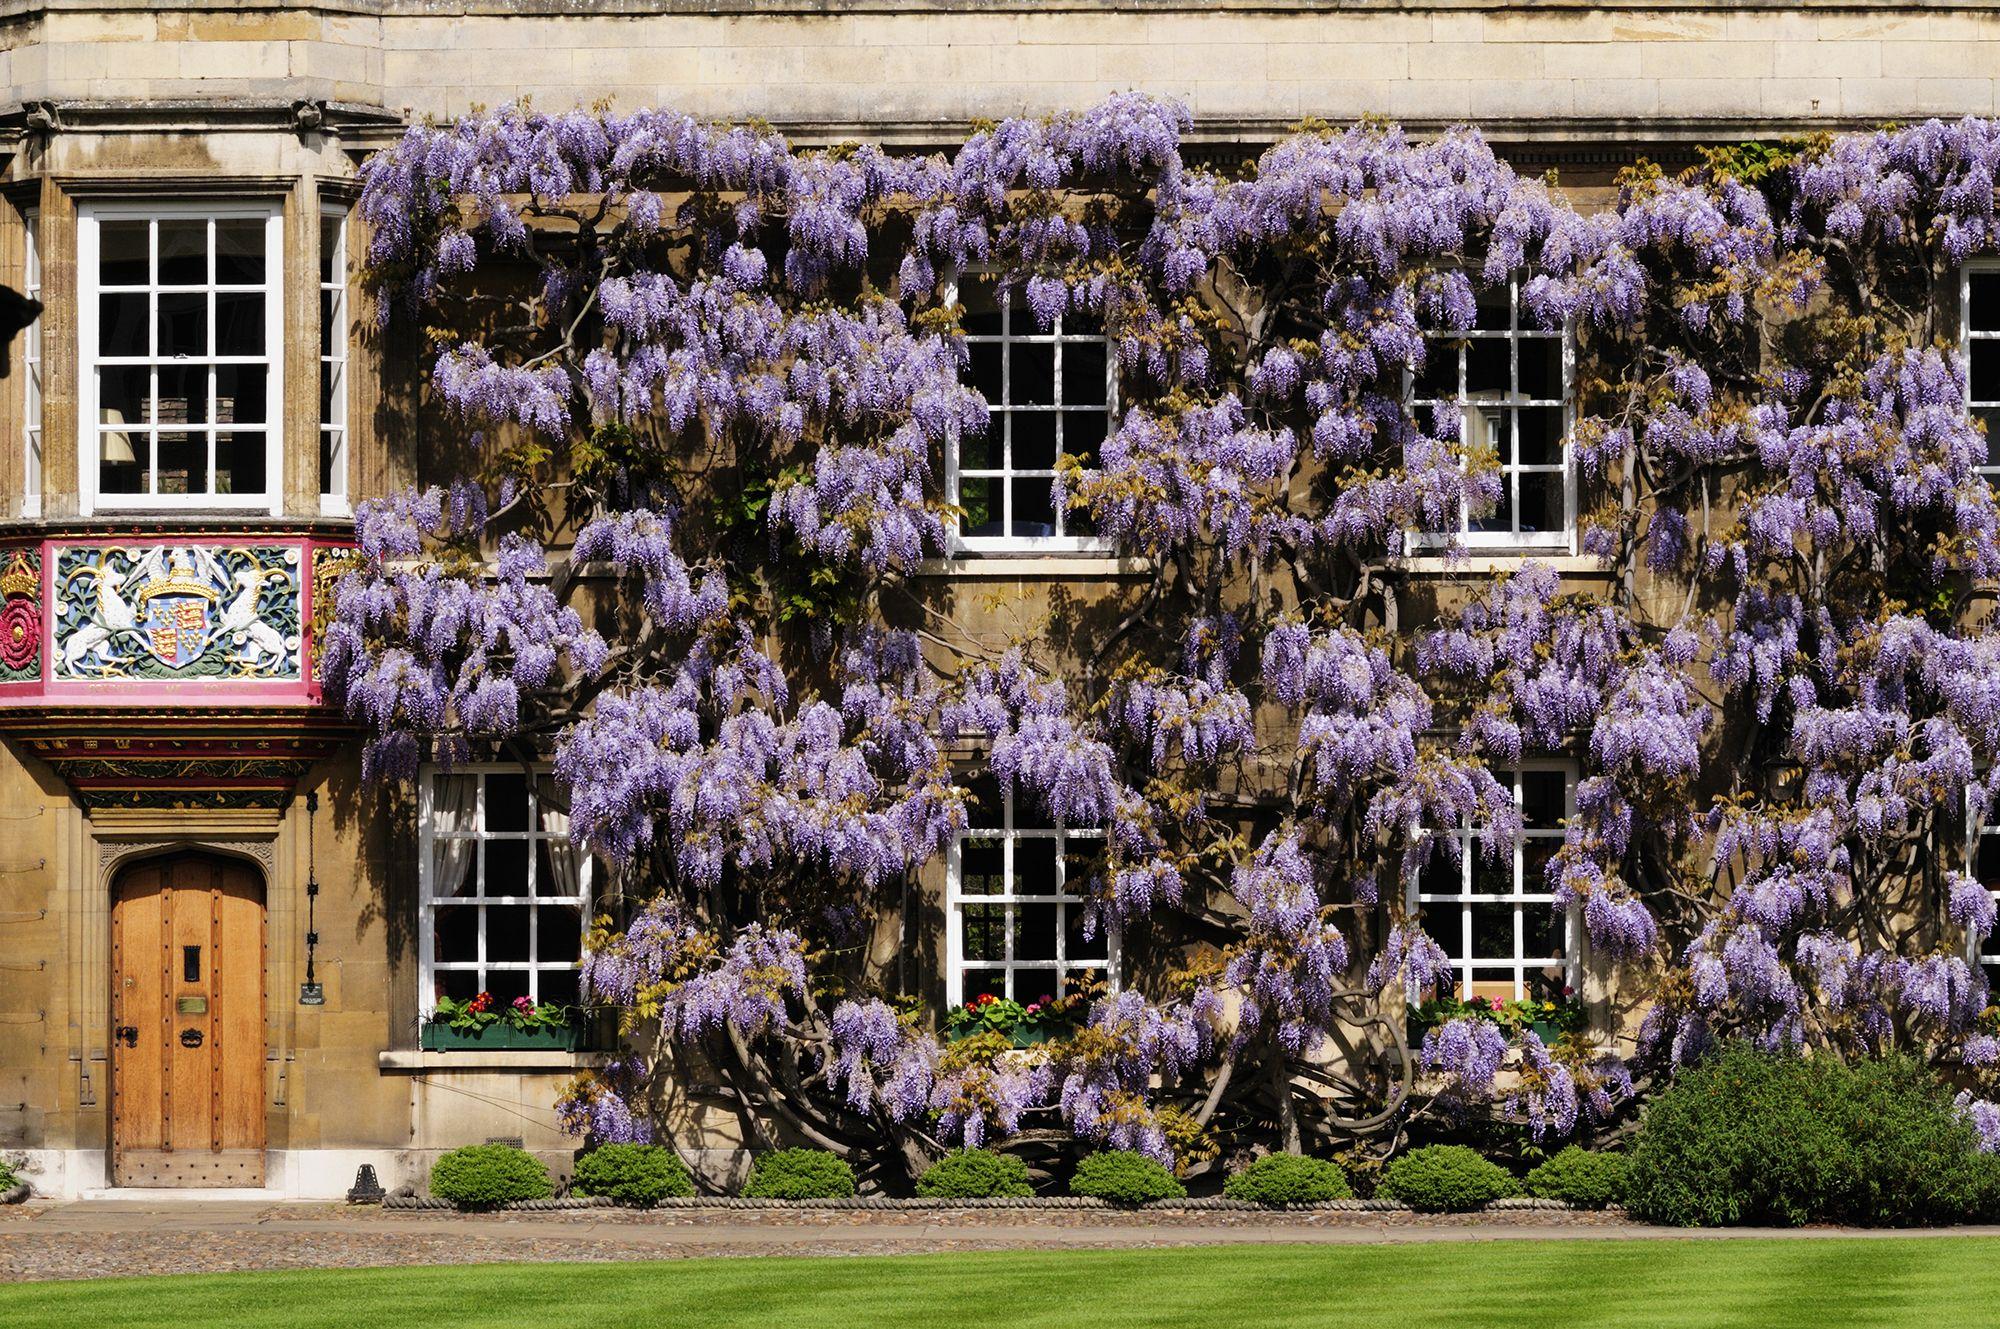 Wisteria growing on University of Cambridge